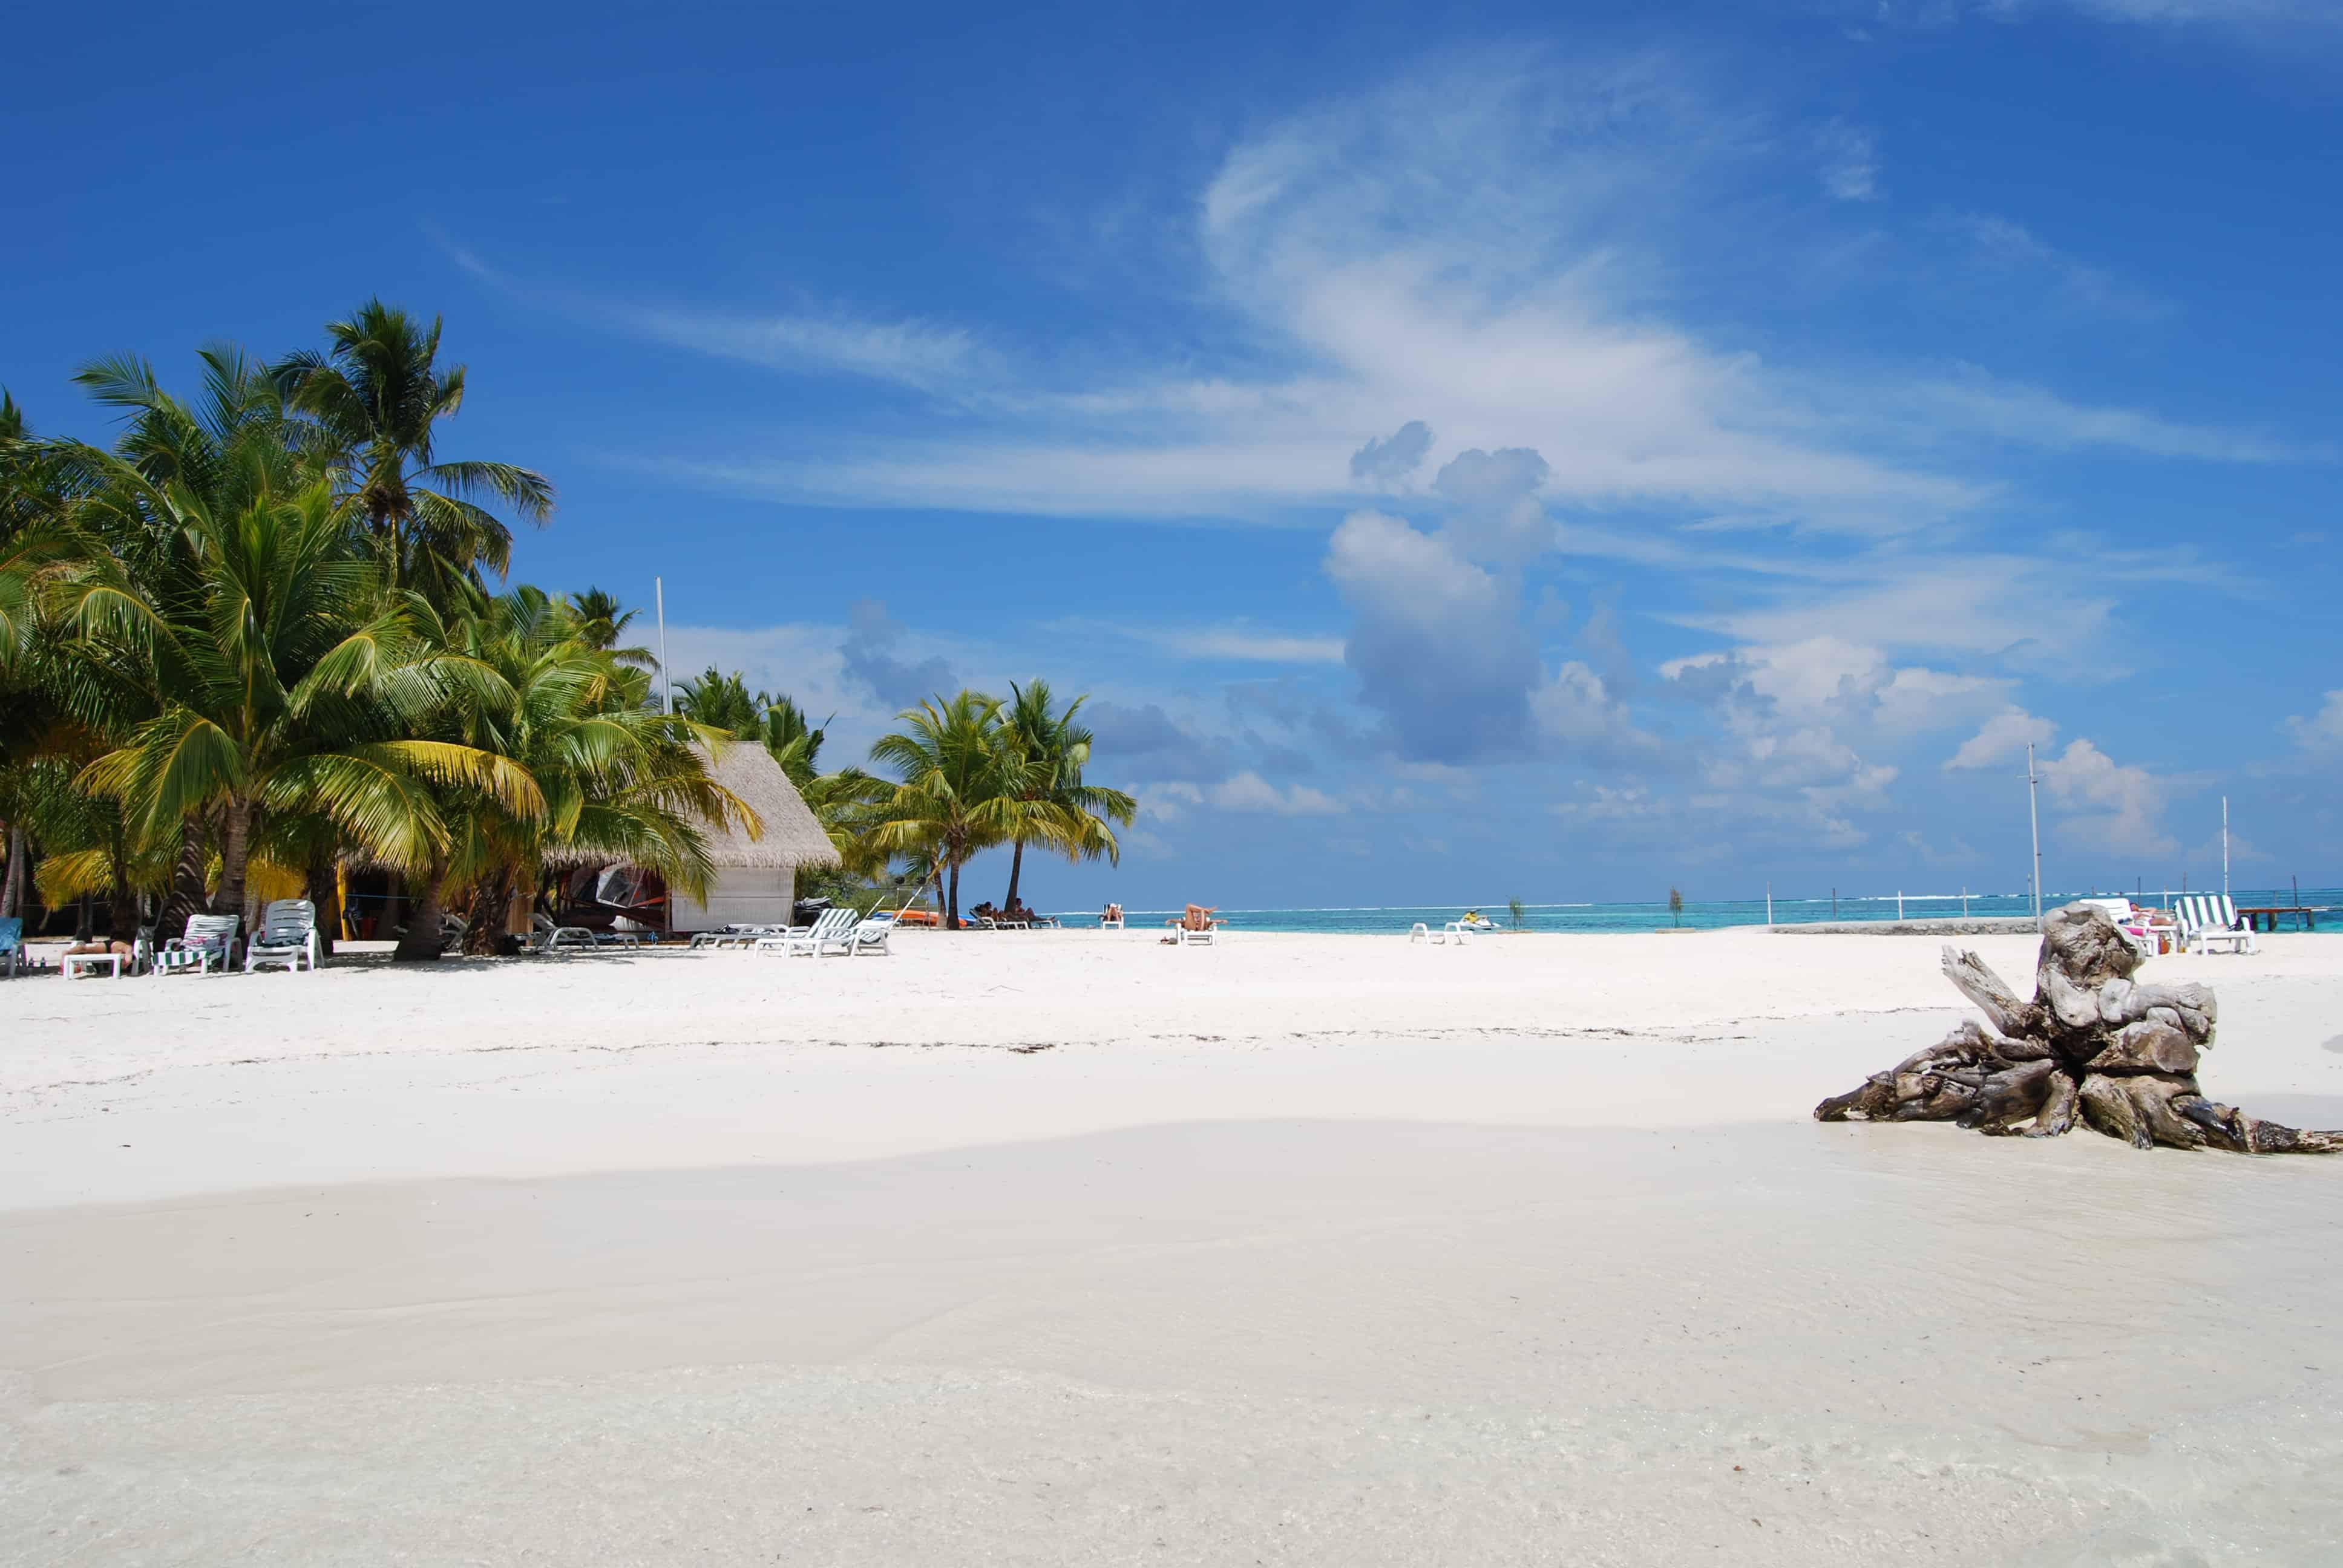 malediven tropisch meer strand - photo #24